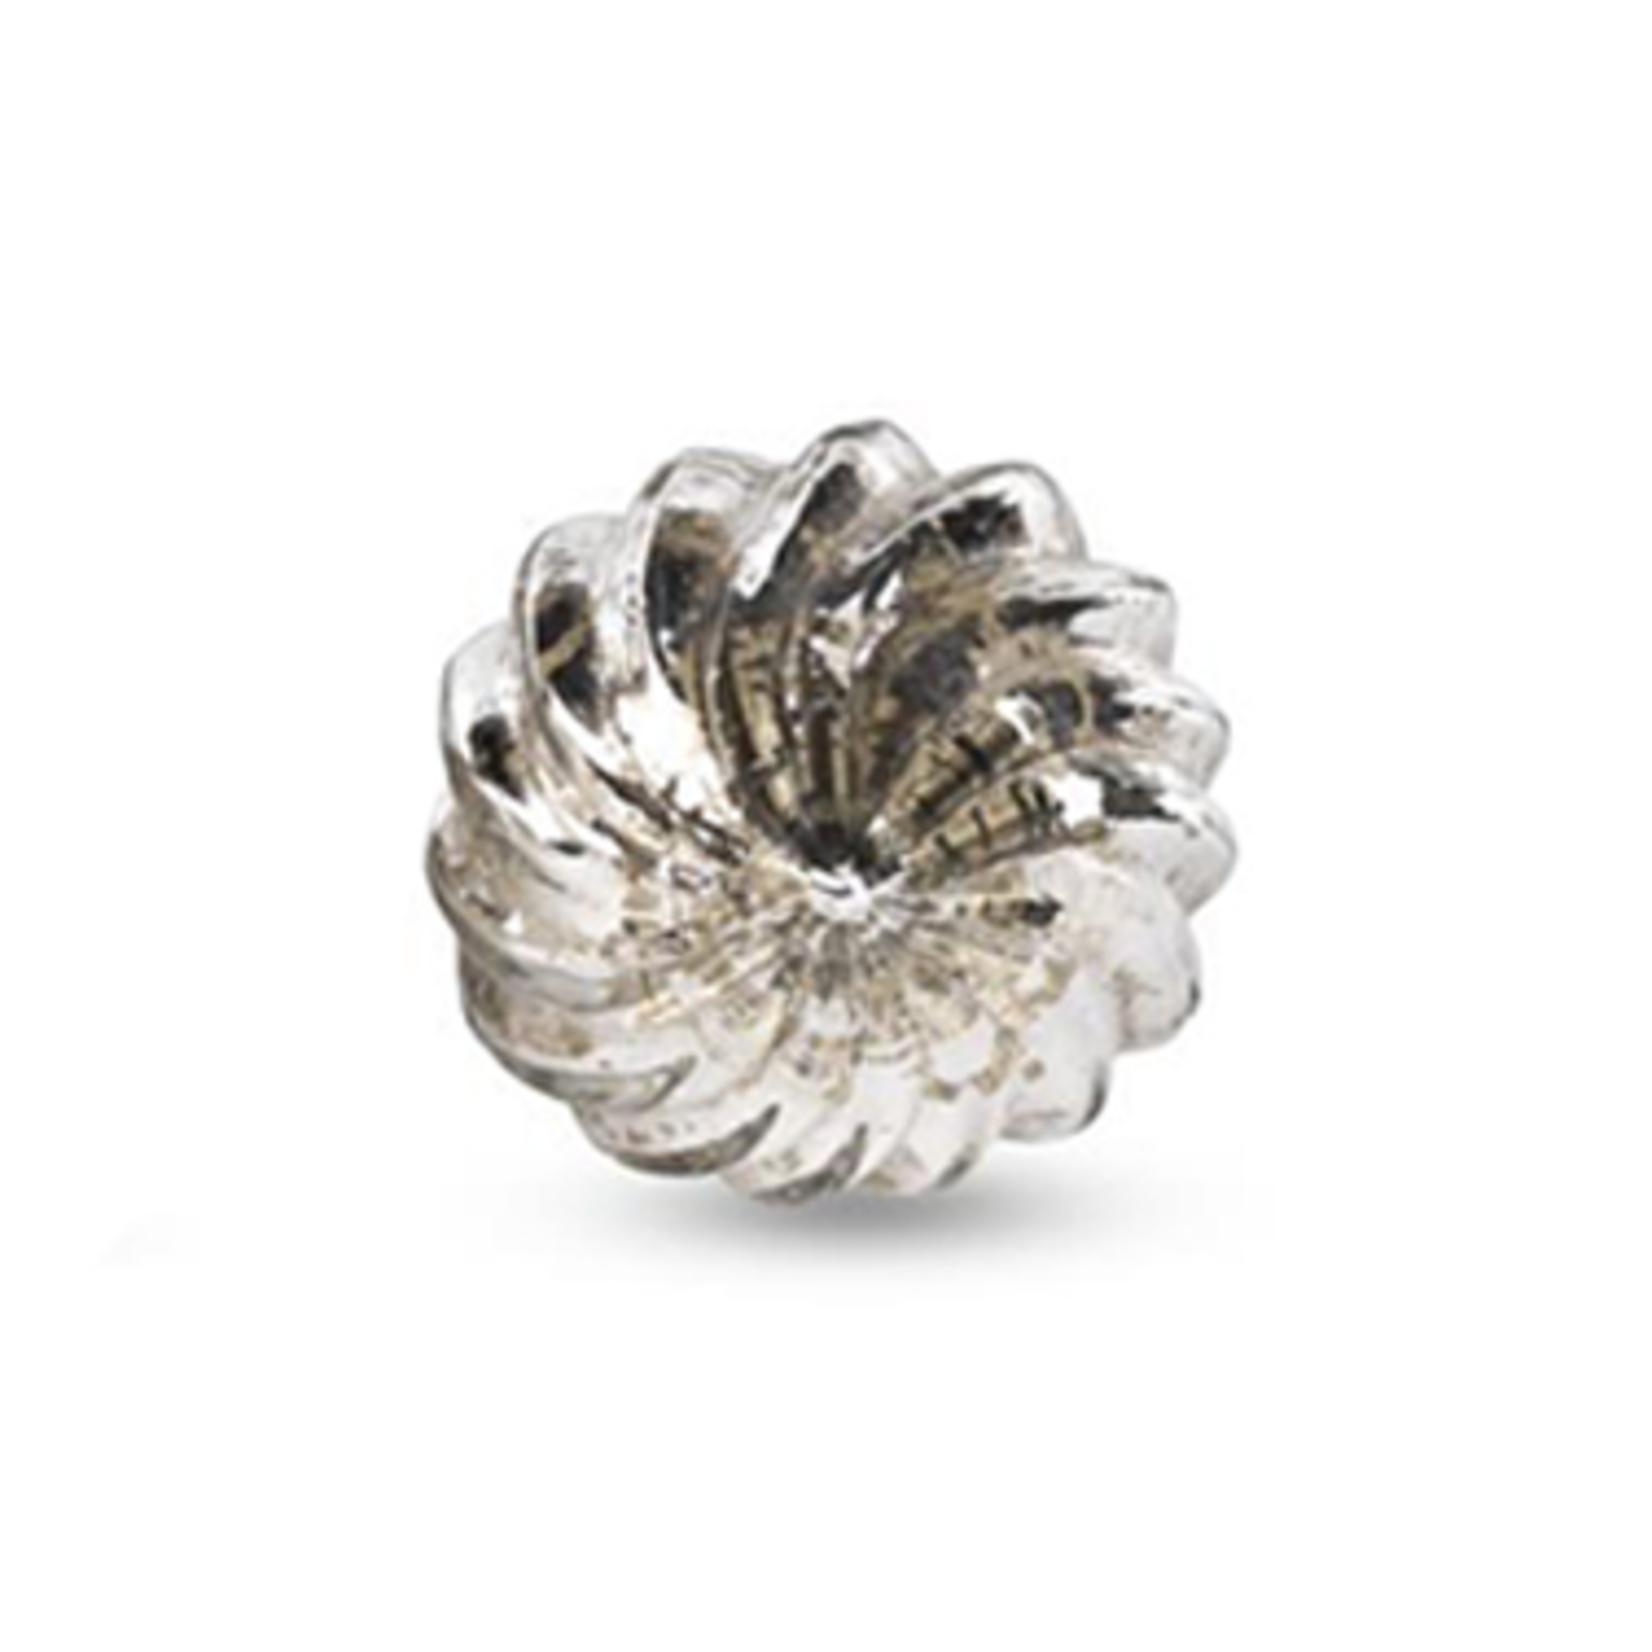 Nkuku Etna Glass Knob - Antique Silver - Spin Top 4cm